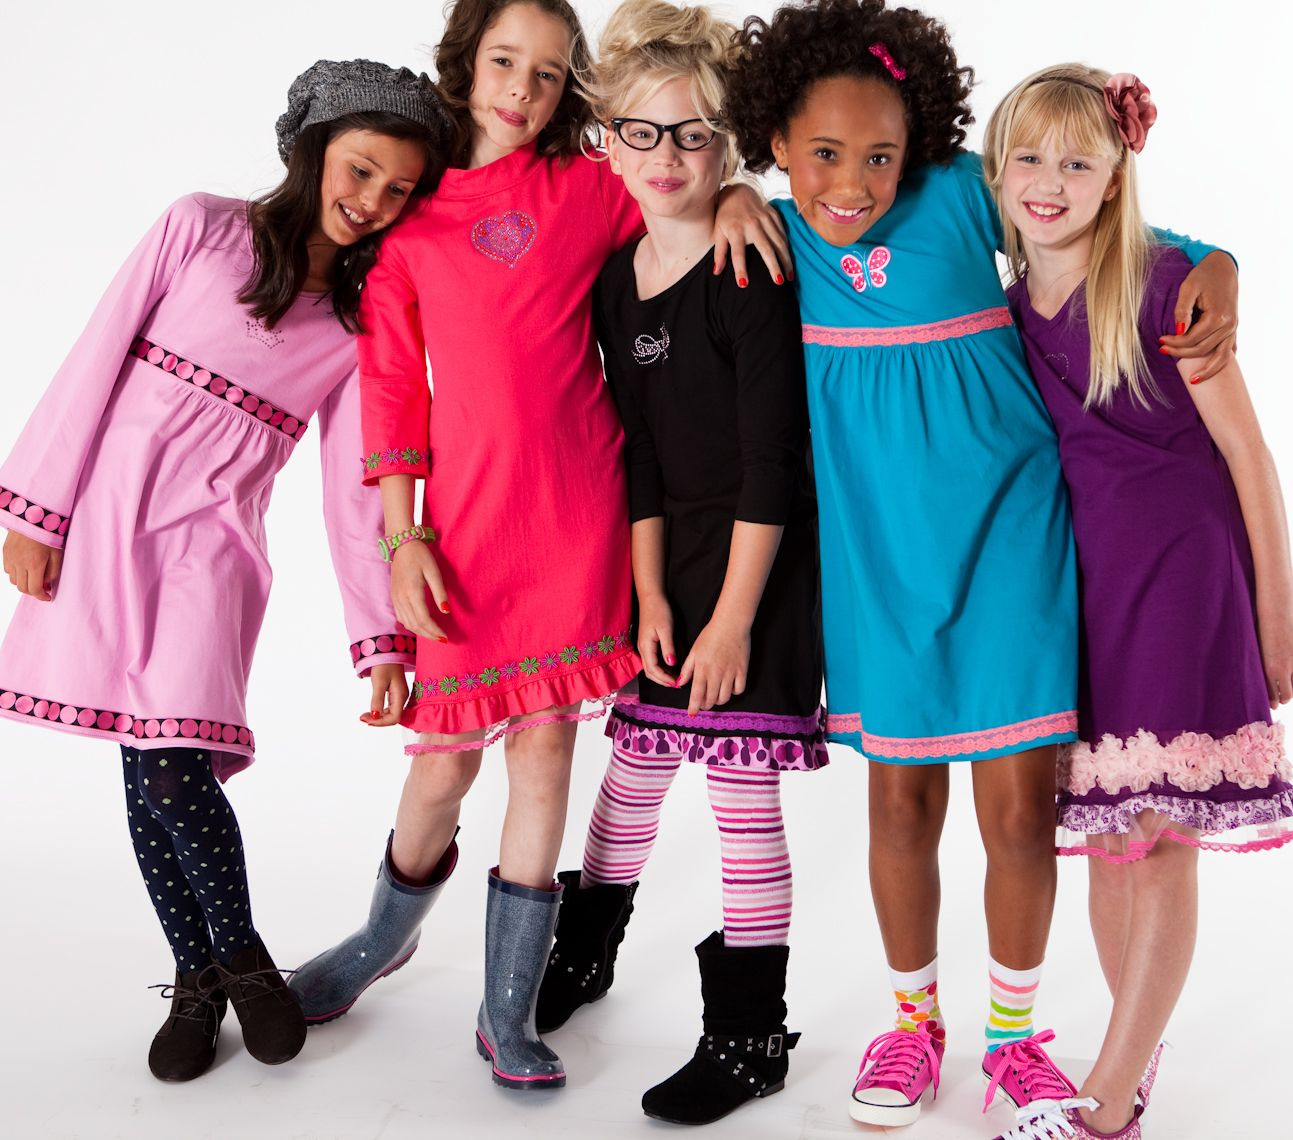 Little Girls Clothing Stores Photo Album - The Fashions Of Paradise